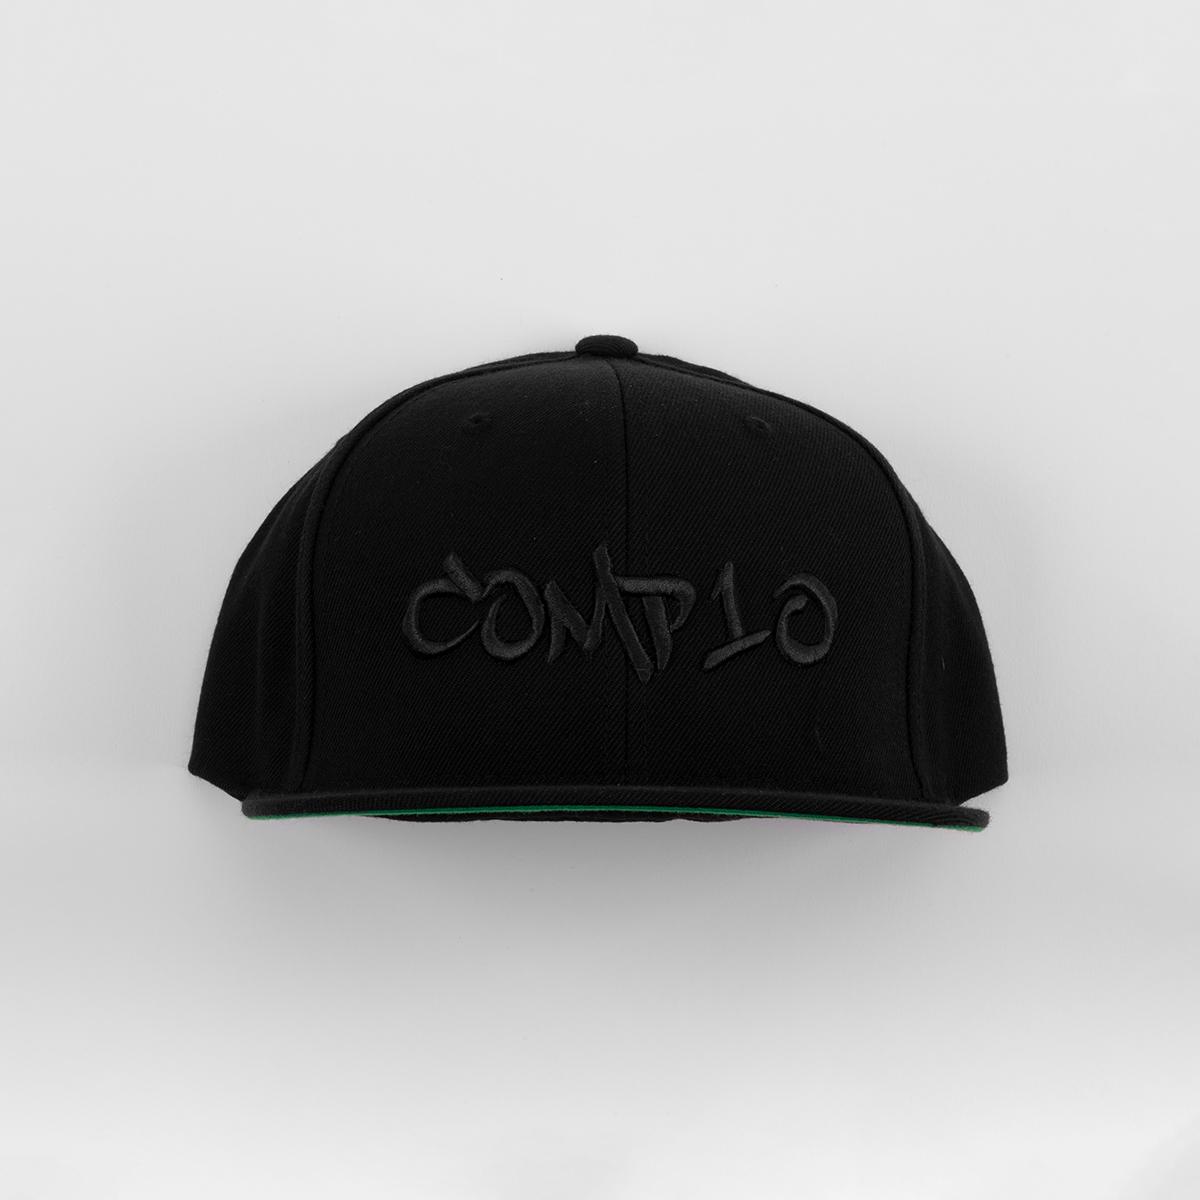 COMP10 Snapback (Black/Black)